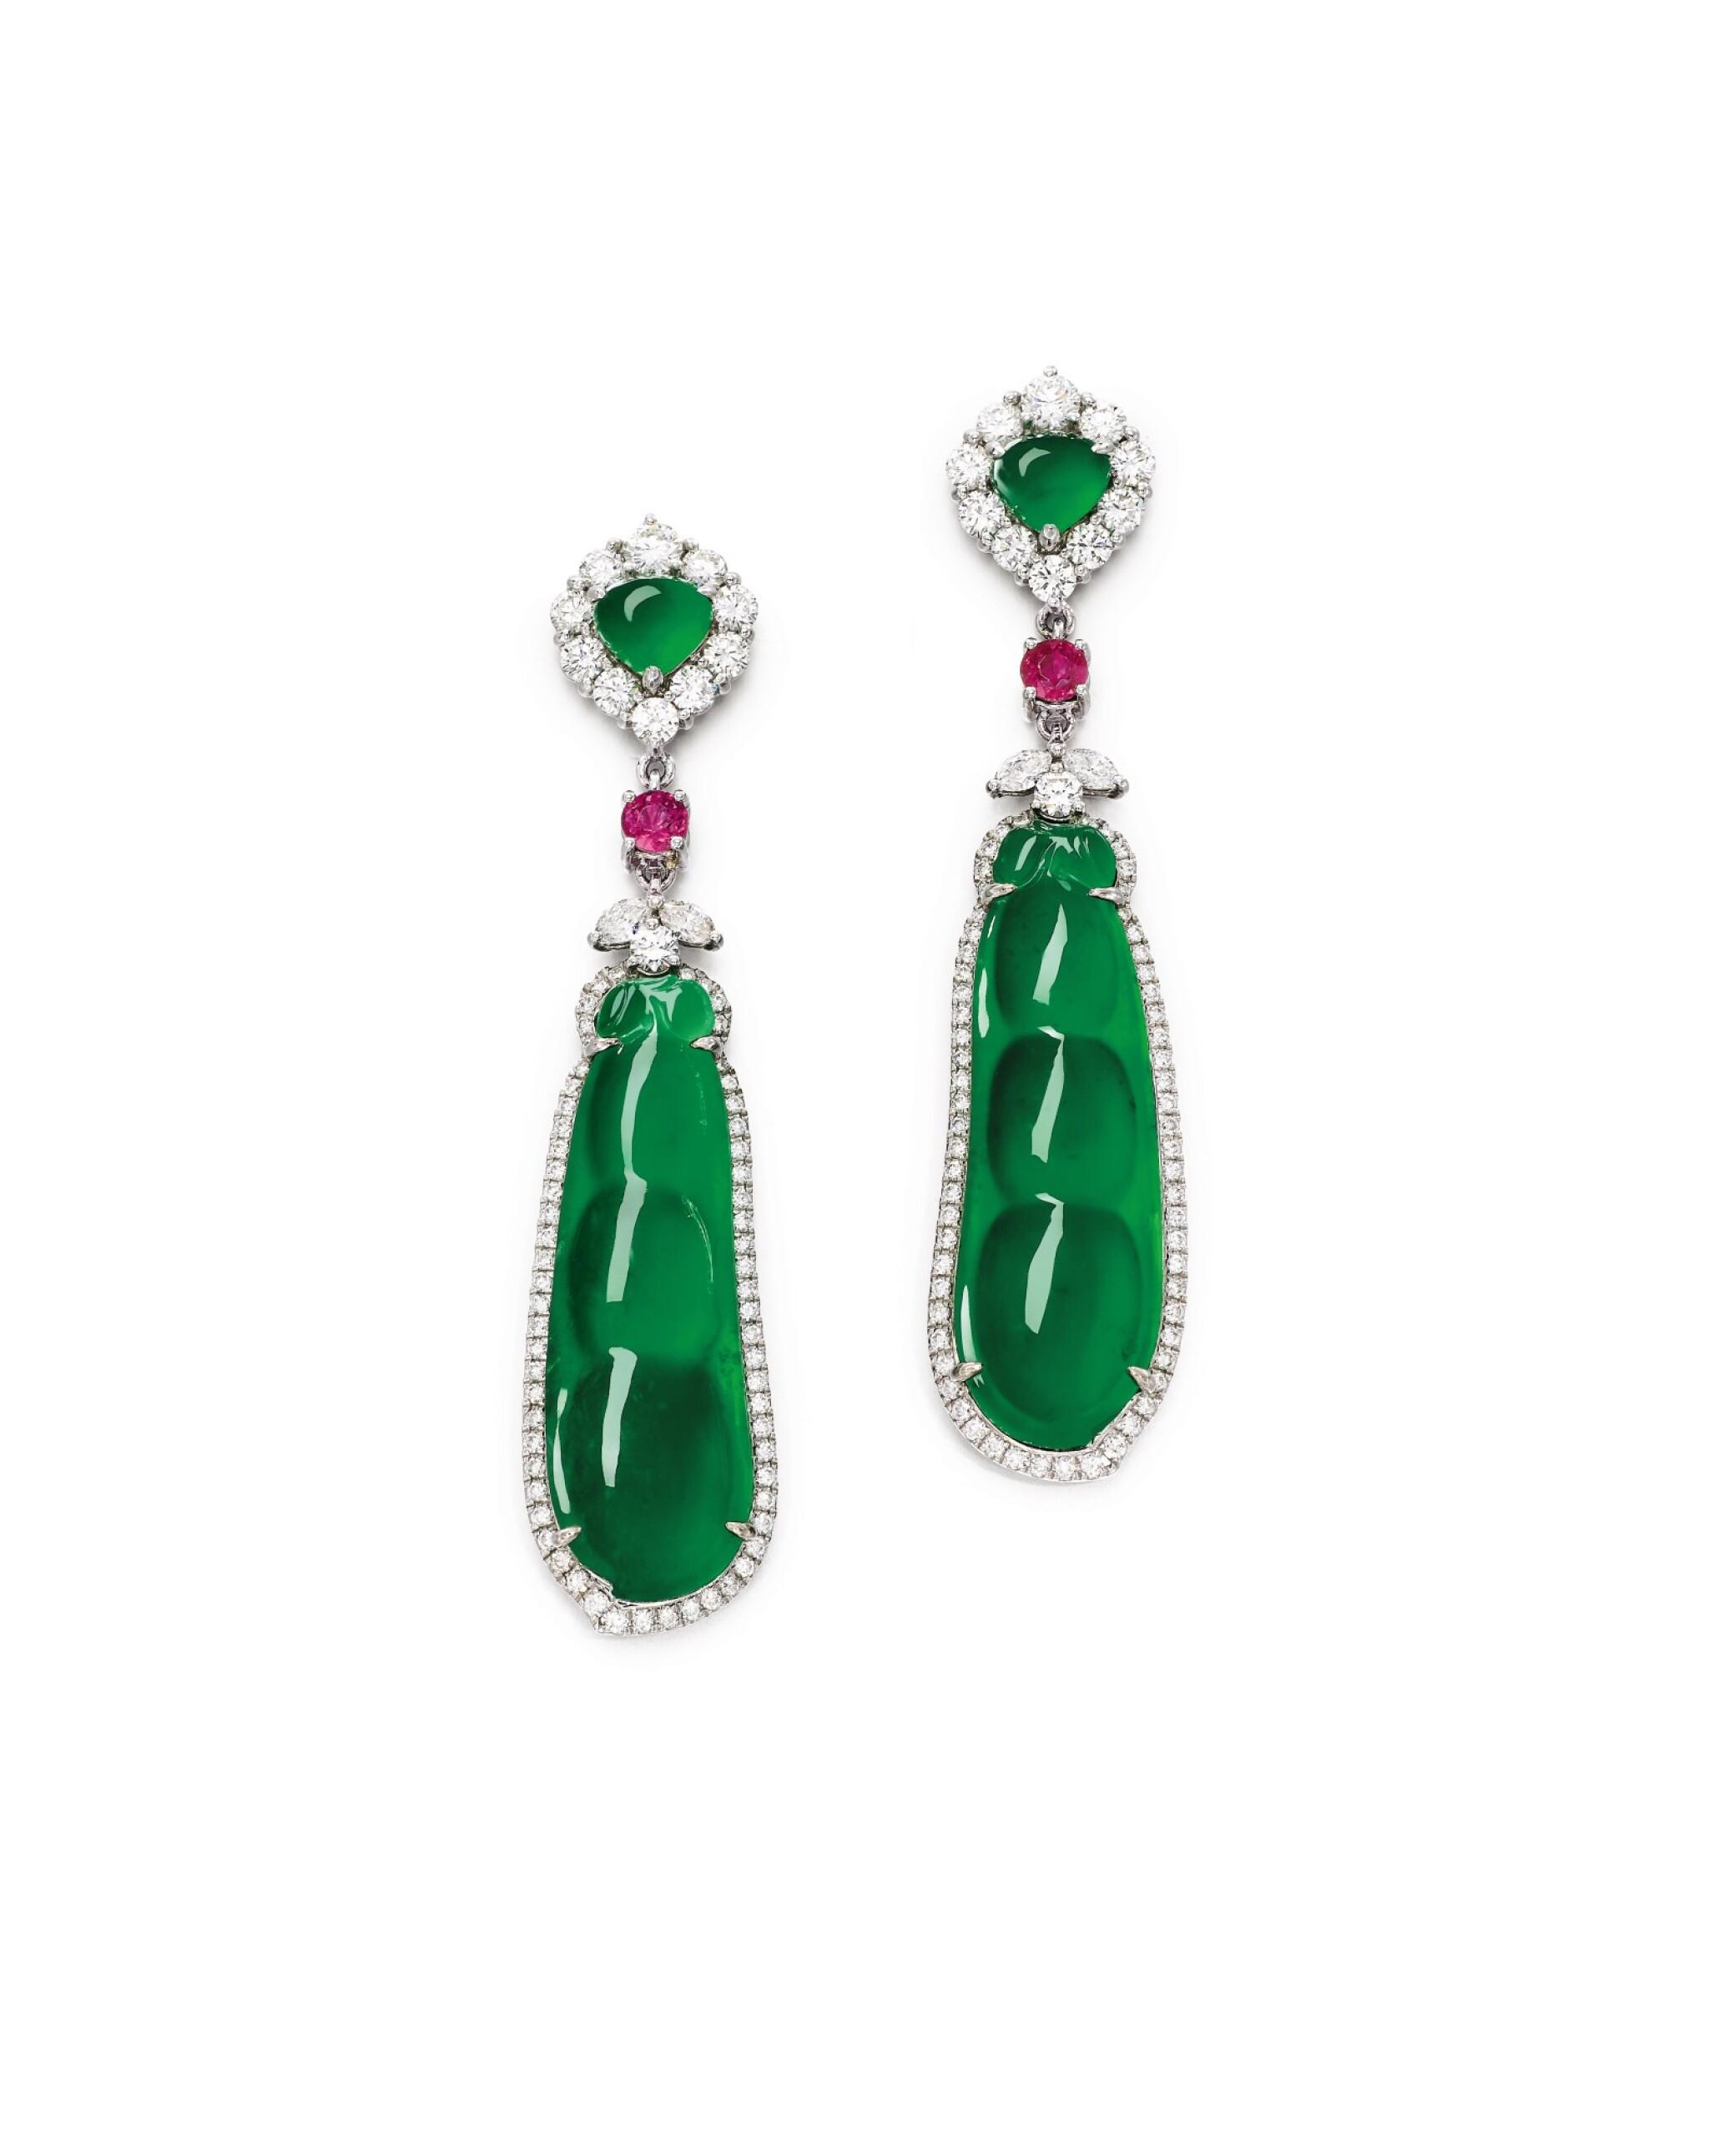 View full screen - View 1 of Lot 1635. Pair of Jadeite, Diamond and Ruby Pendent Earrings | 天然翡翠雕「福豆」 配 鑽石 及 紅寶石 耳墜一對.